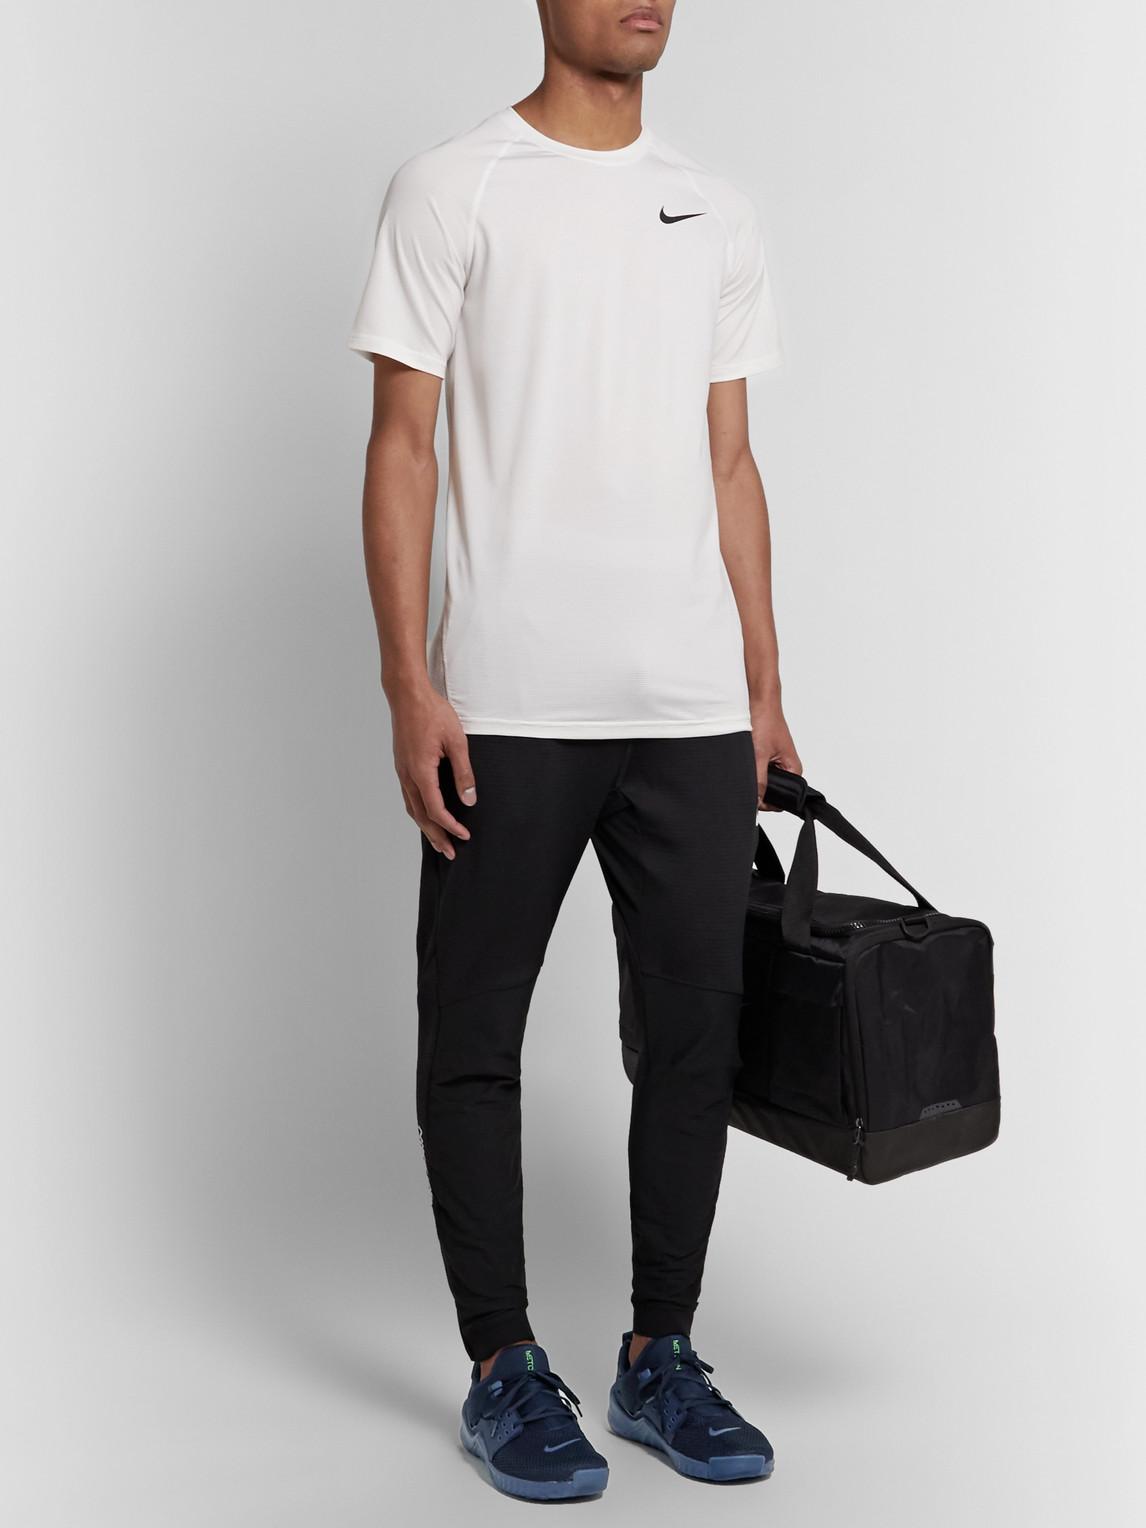 Nike Sneakers FREE X METCON 2 MESH AND NEOPRENE SNEAKERS